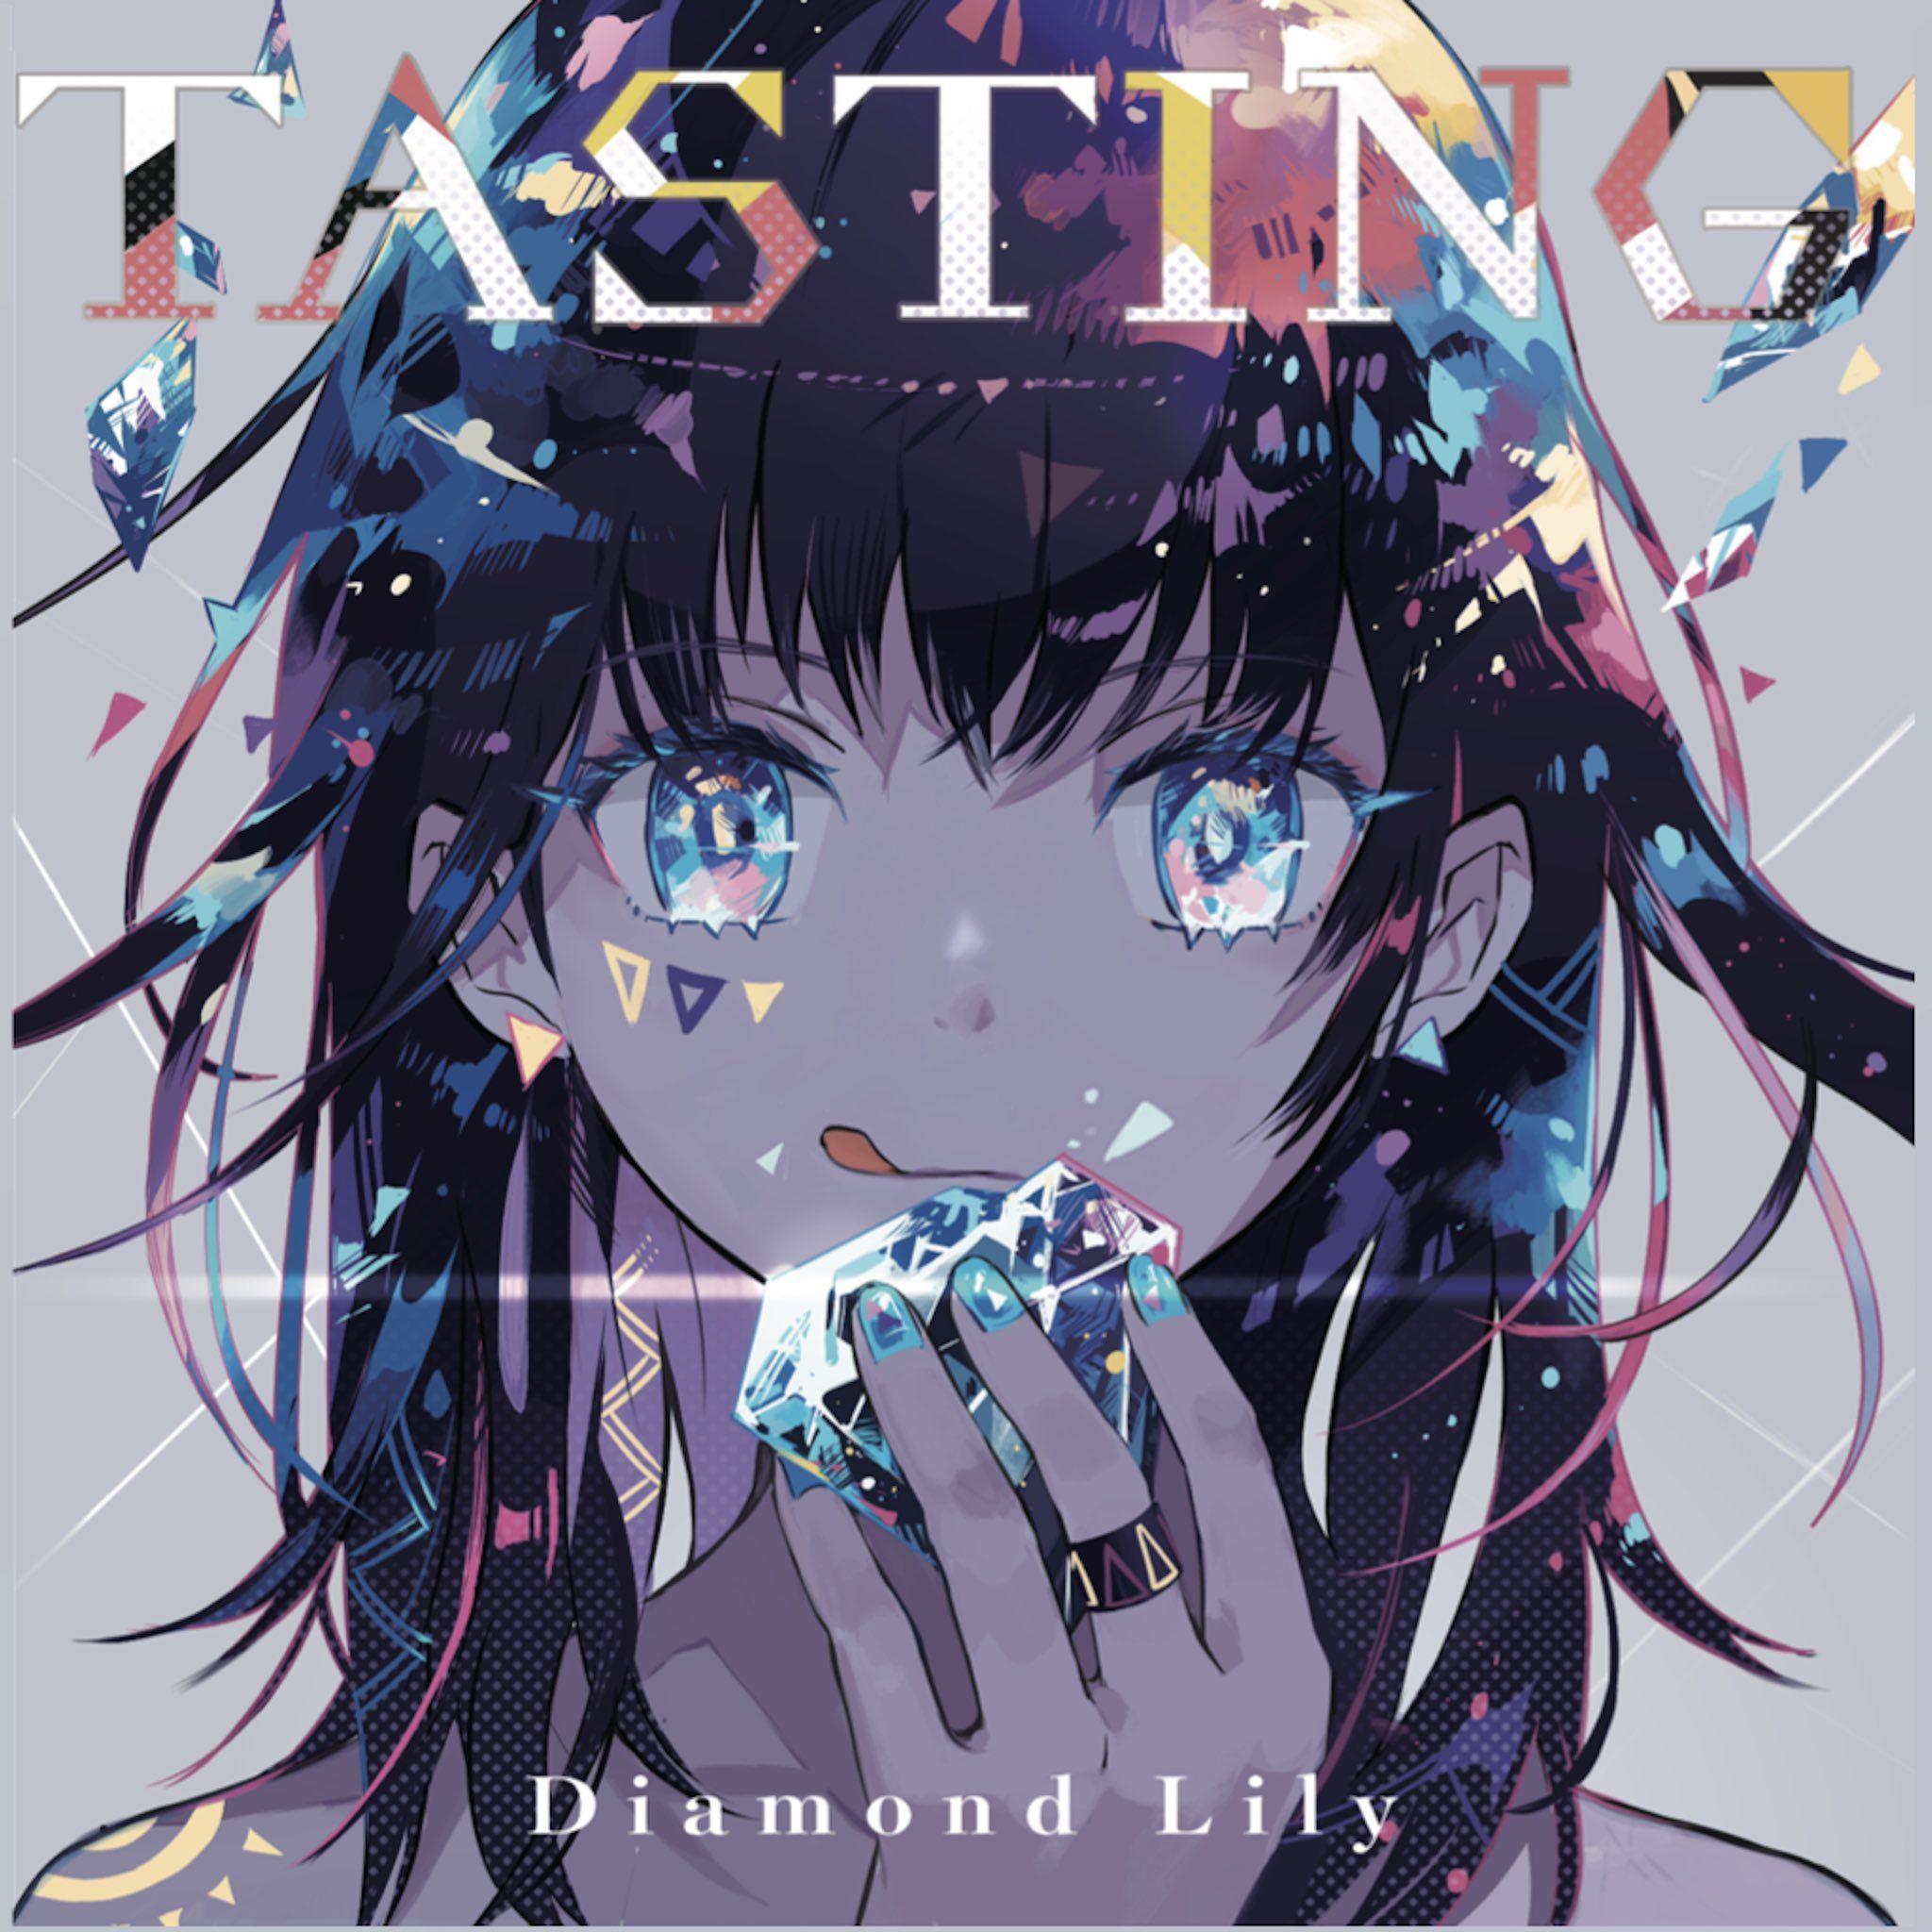 diamond lily on twitter 芸術的アニメ少女 イラスト イラストレーター